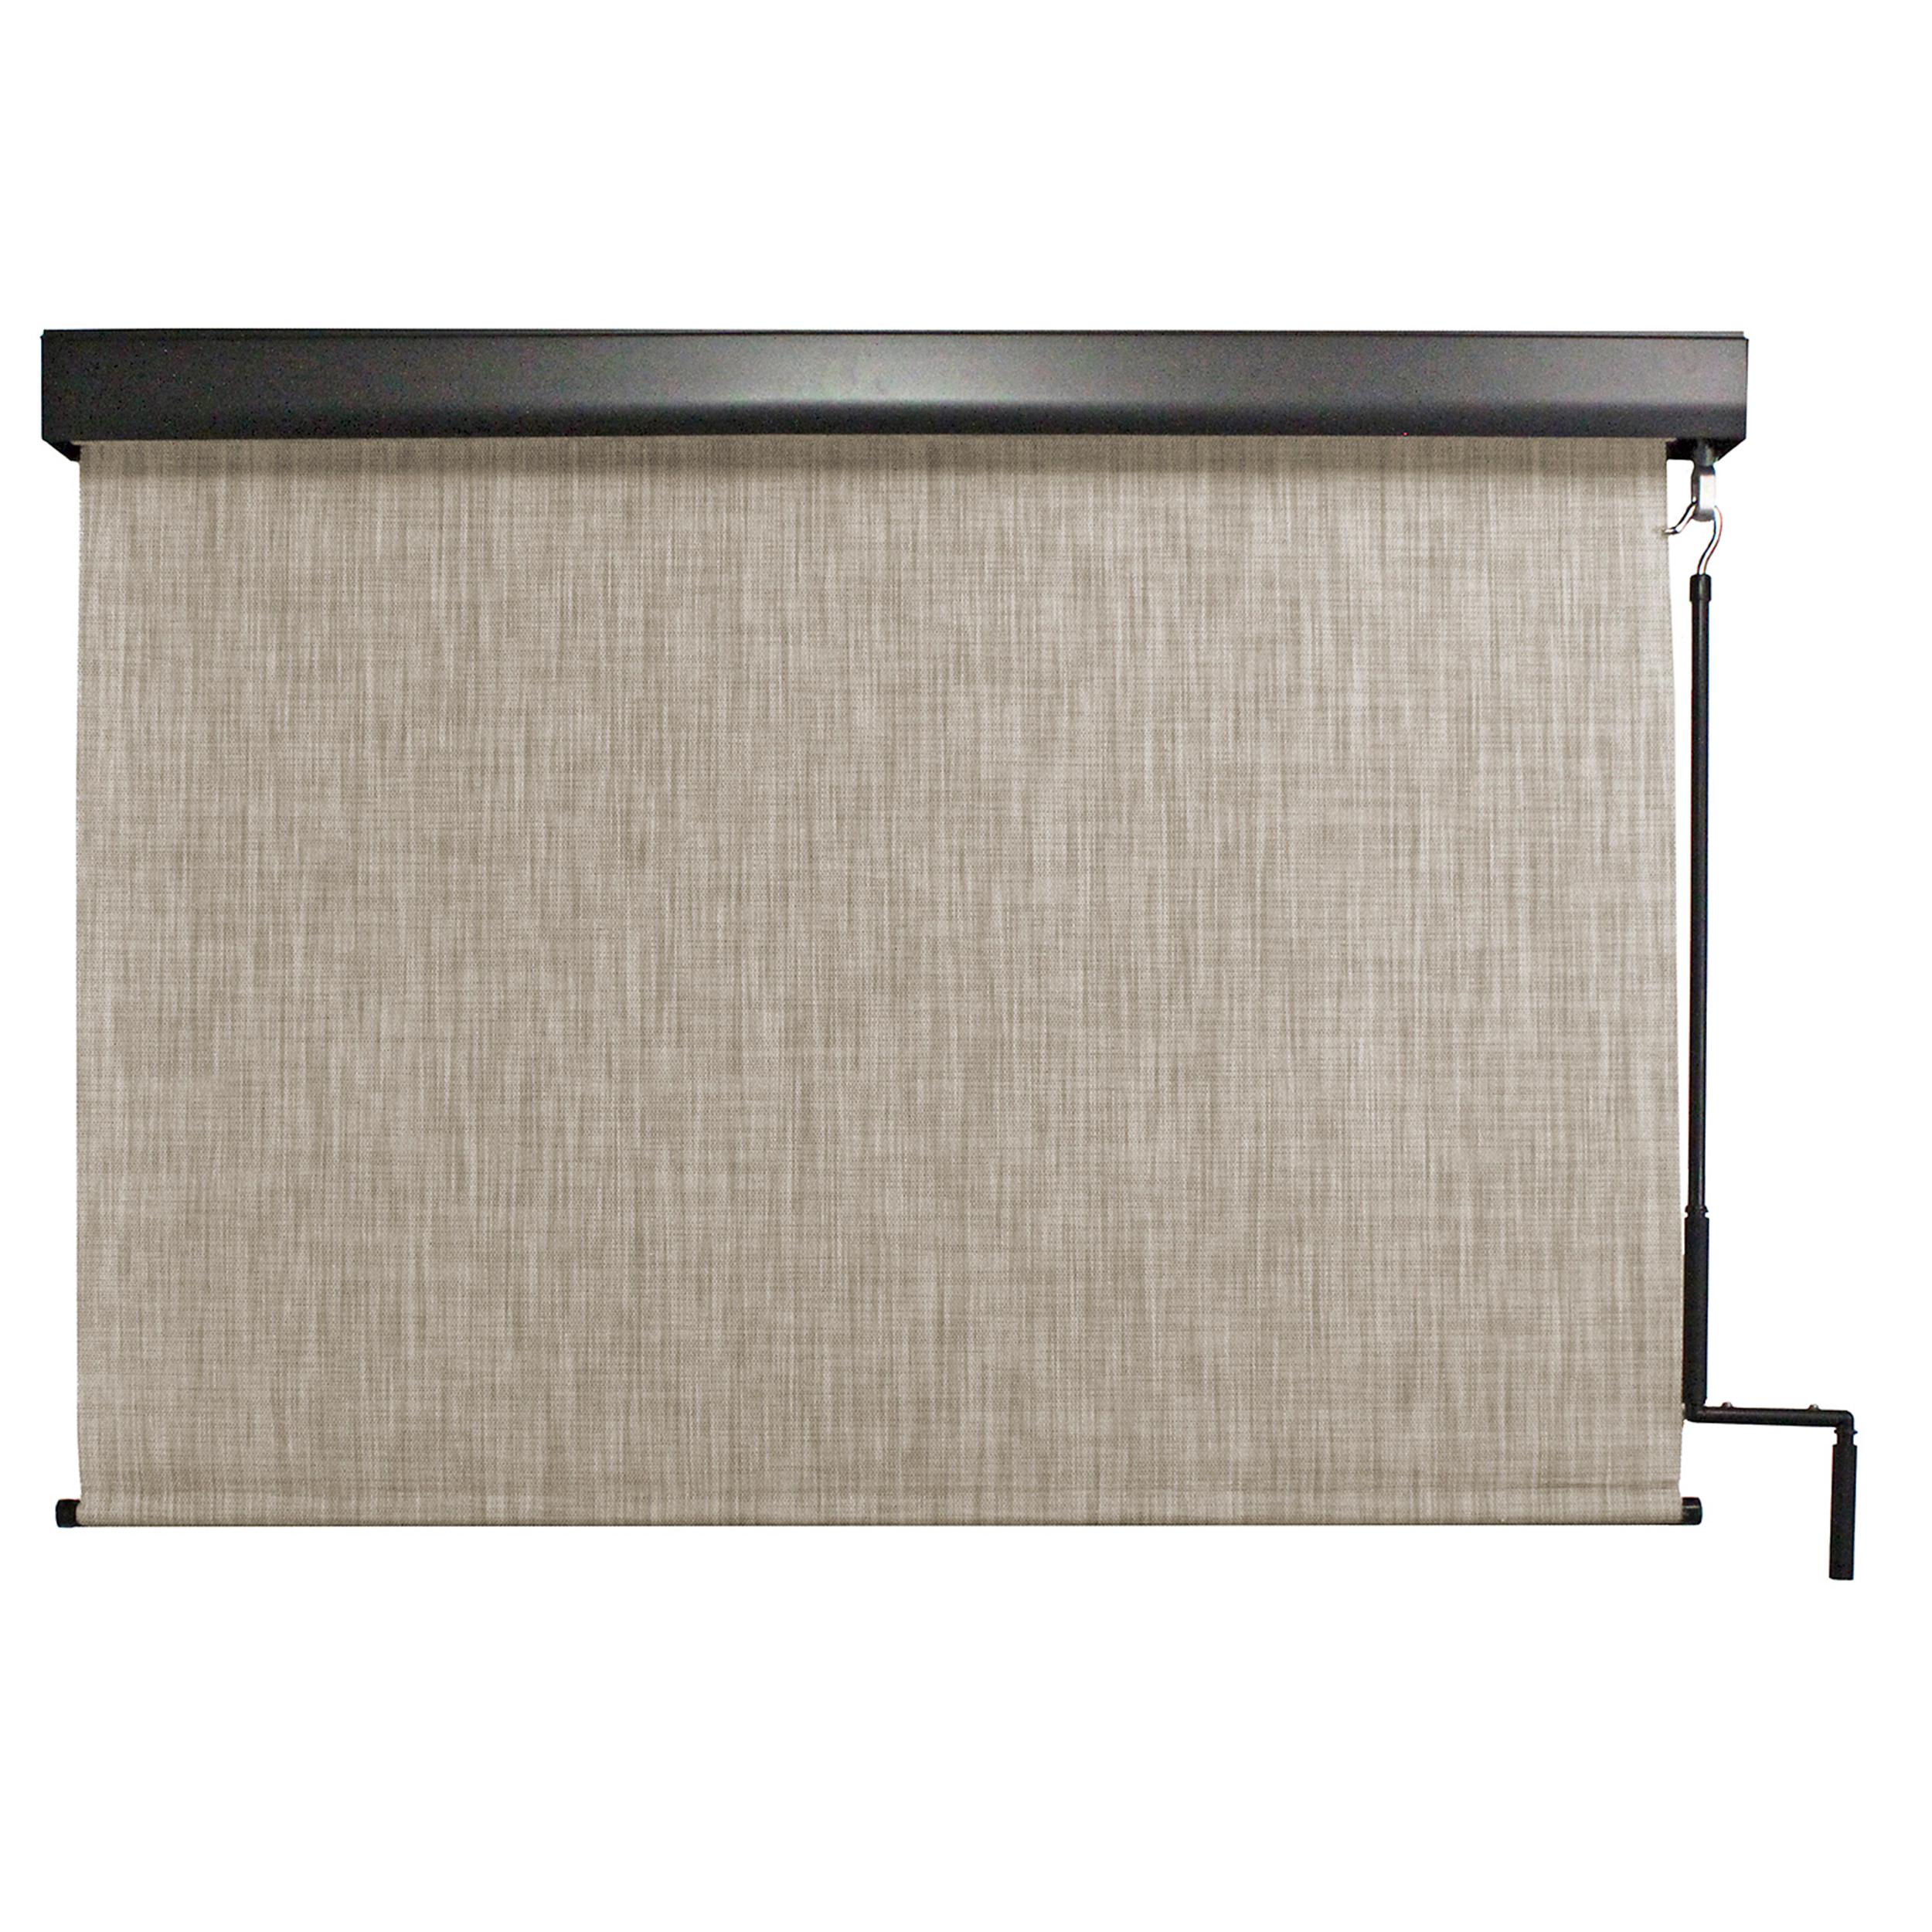 Valanced Sunshade, Titanium Series, 4' W x 8' Drop, Caribbean Fabric